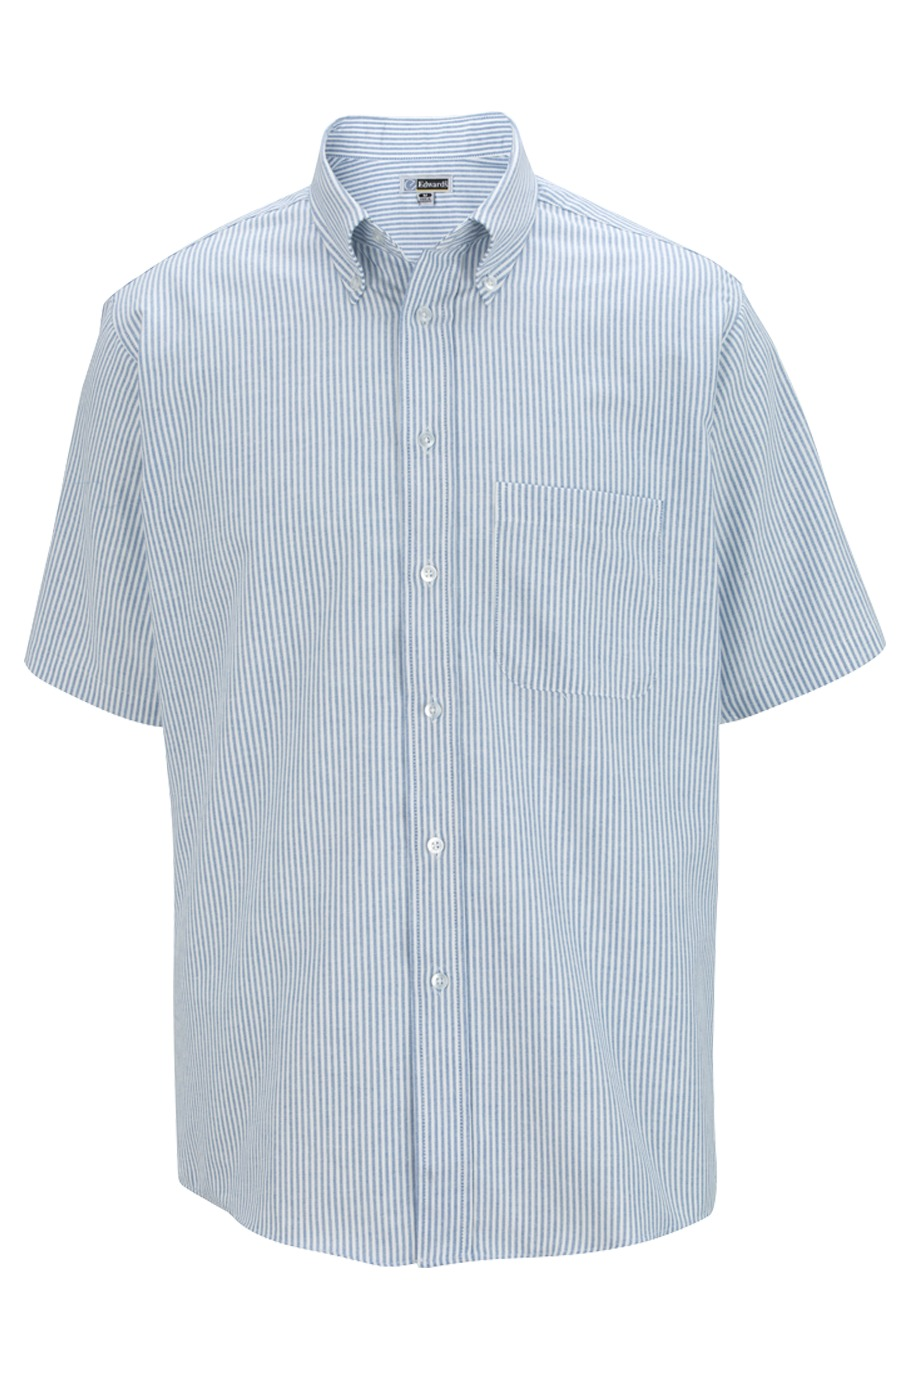 Short Sleeve Oxford Pin Stripe Shirt-Nucrisp